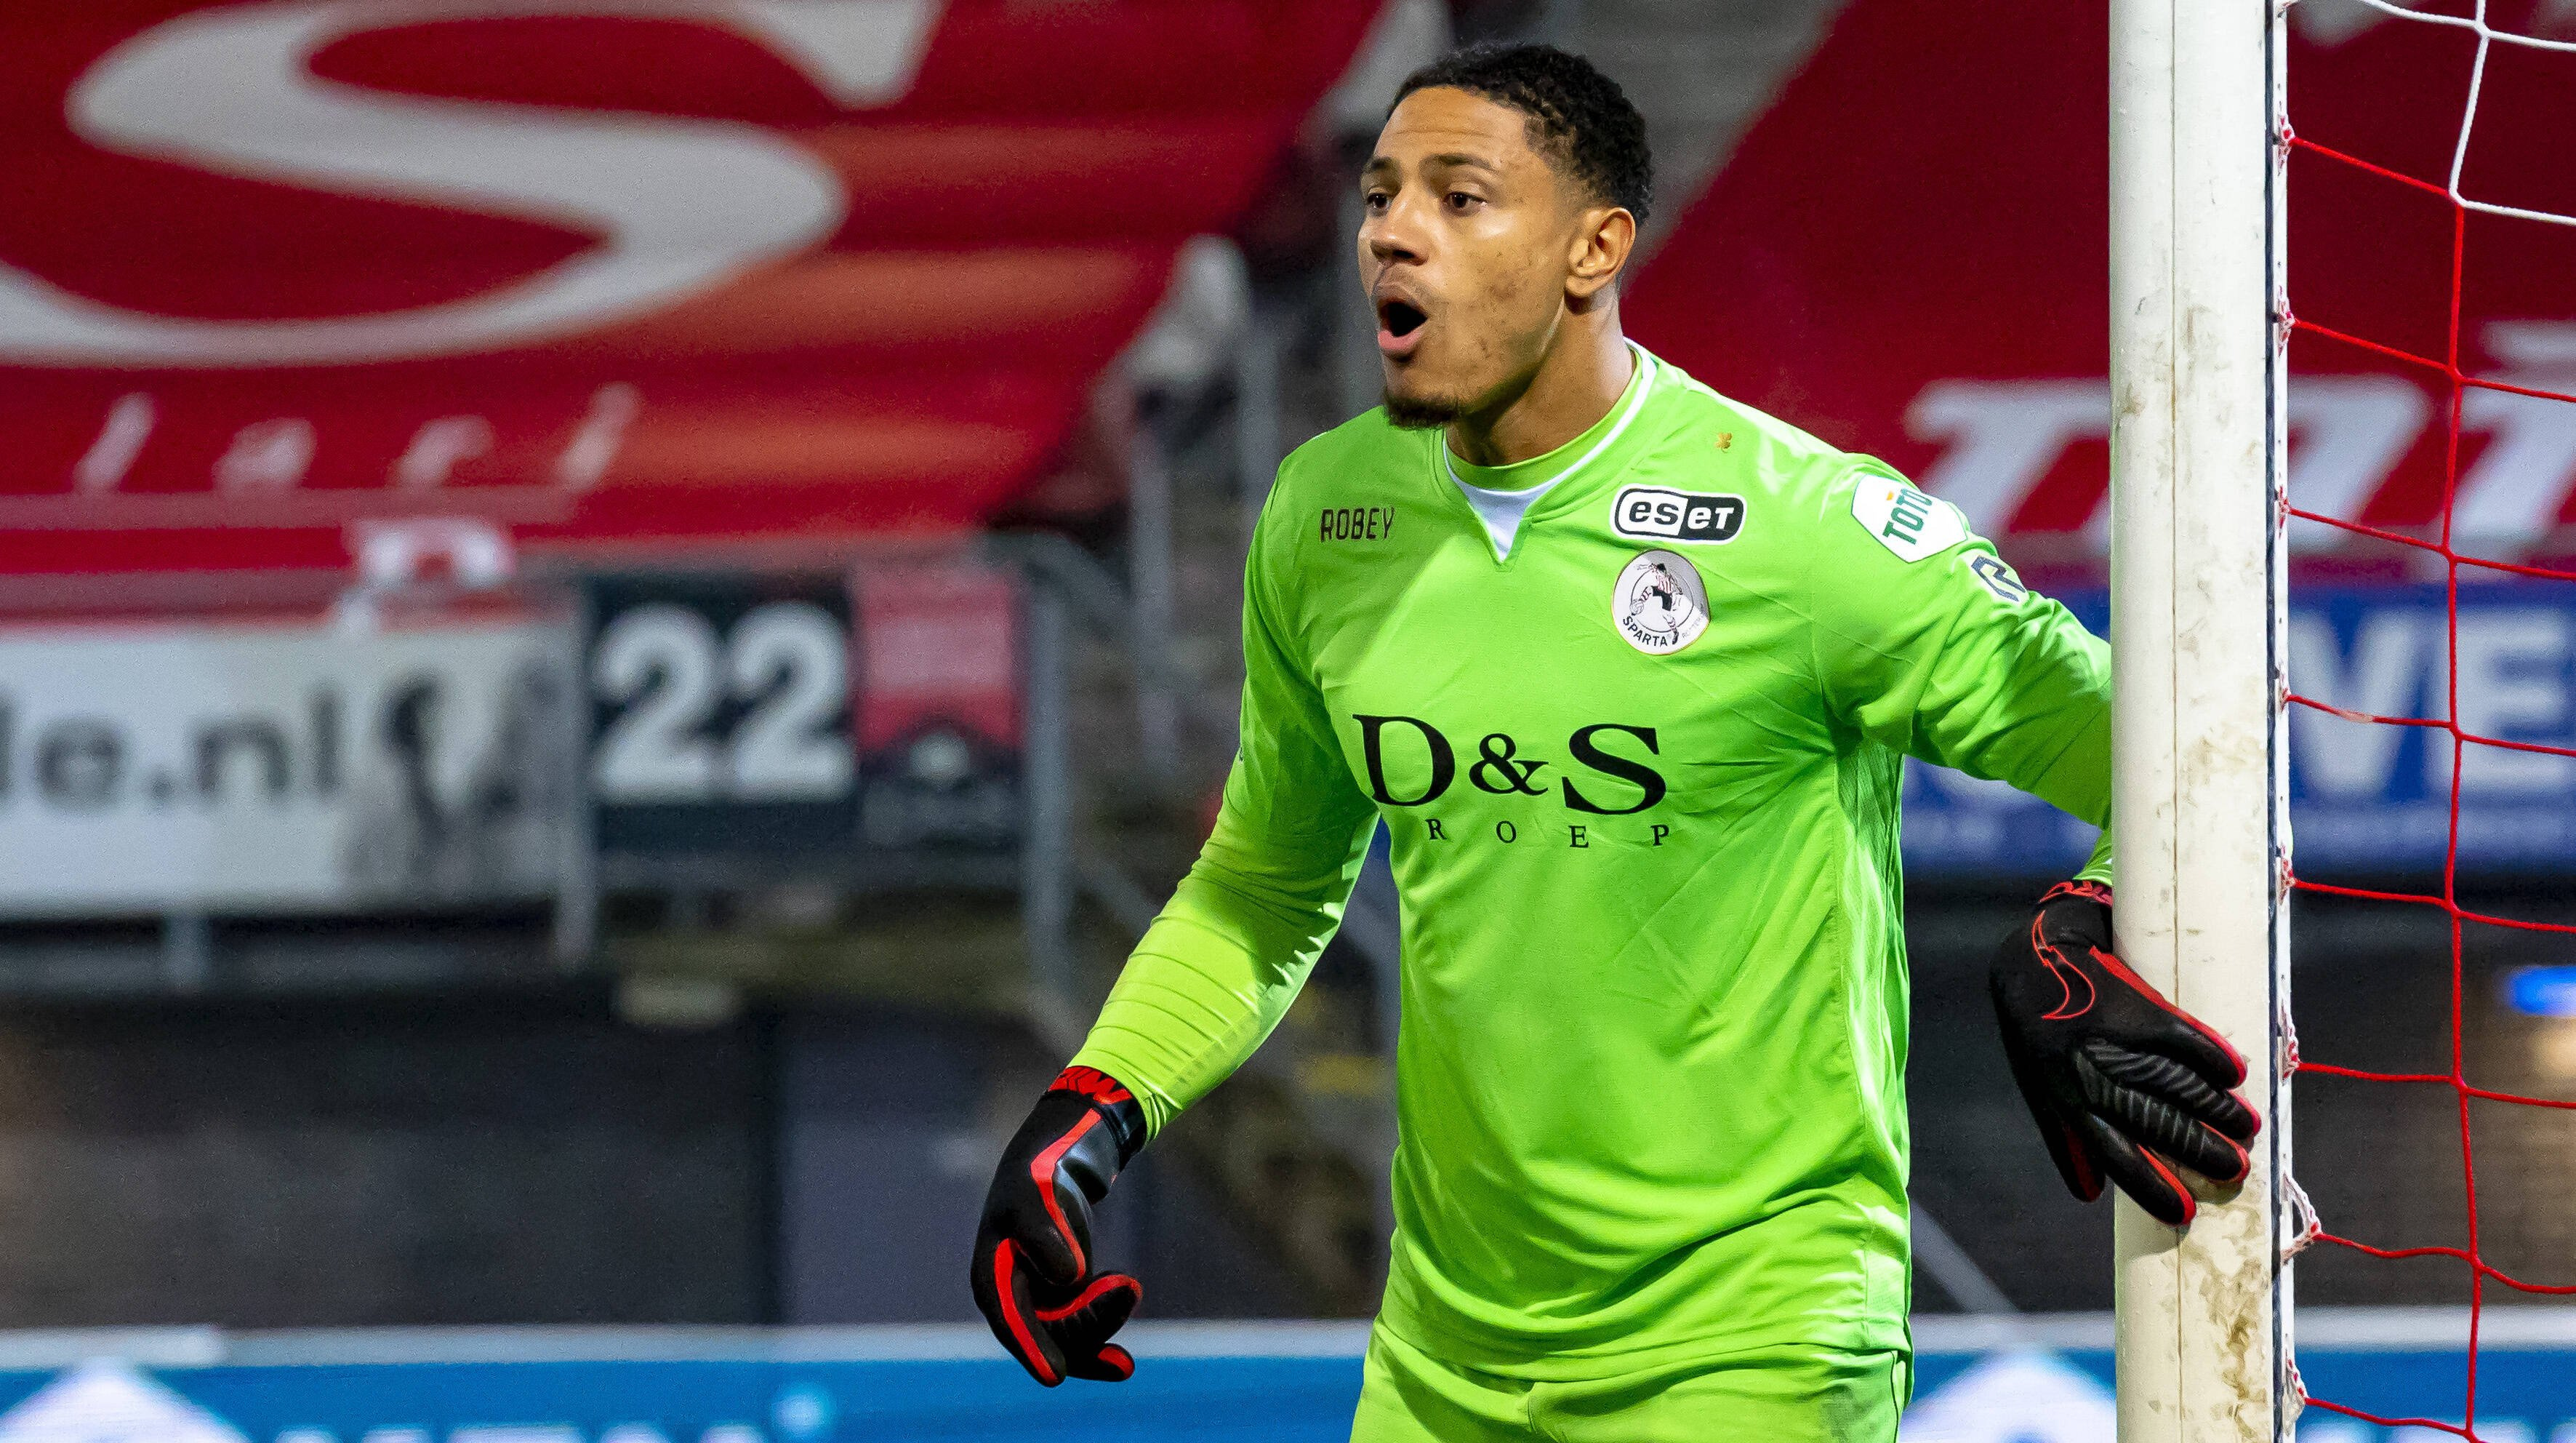 Maduka Okoye wanted by Ajax - Transfer with loan-back an option? |  Transfermarkt